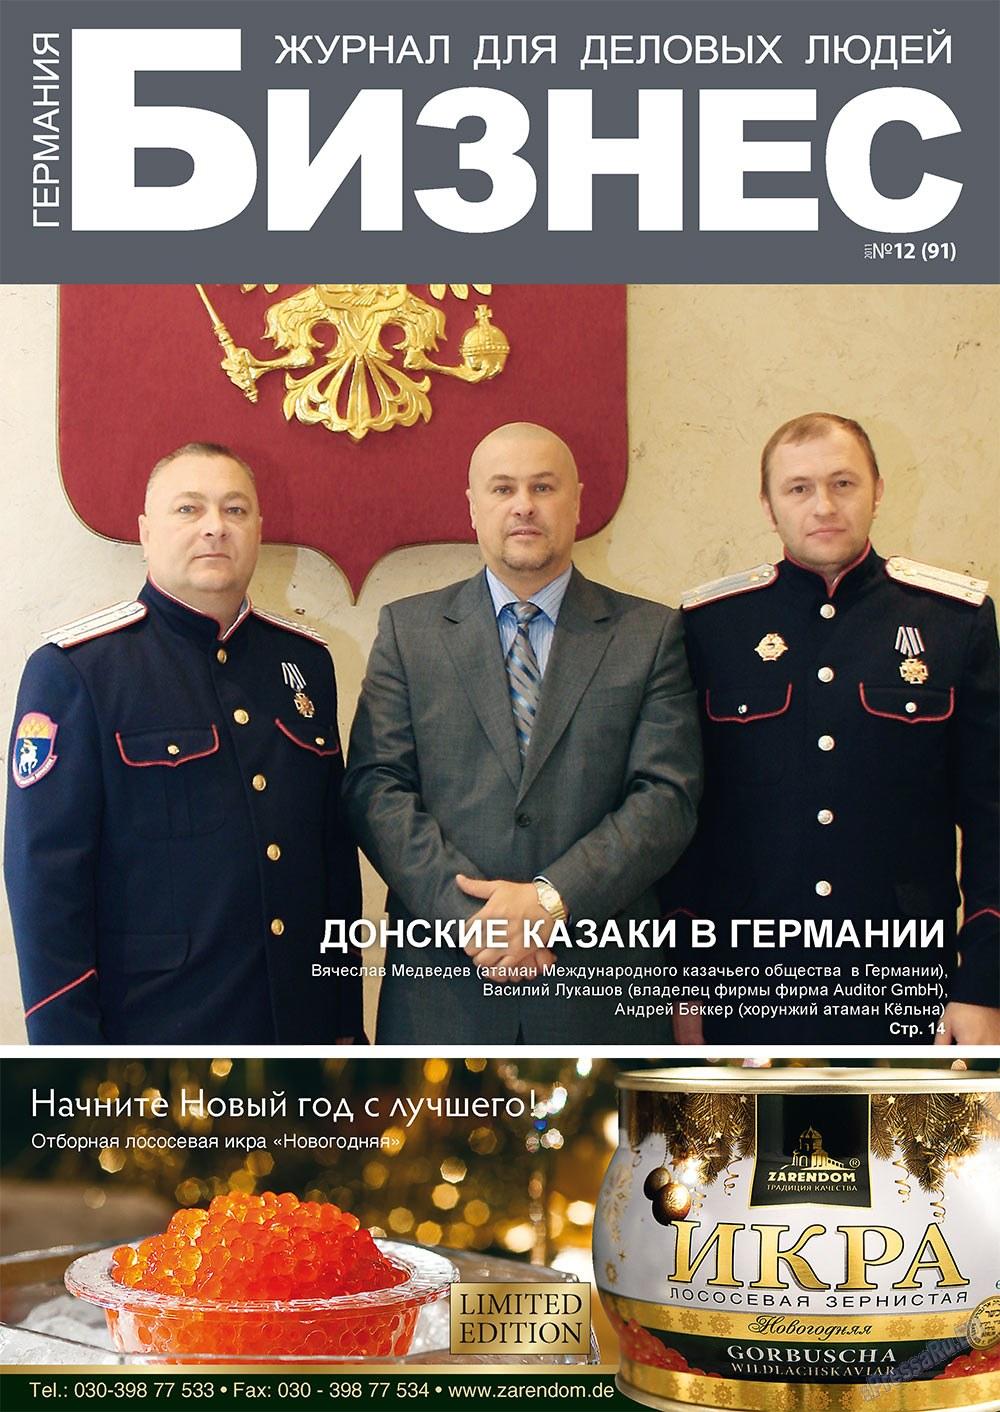 Бизнес (журнал). 2011 год, номер 12, стр. 1